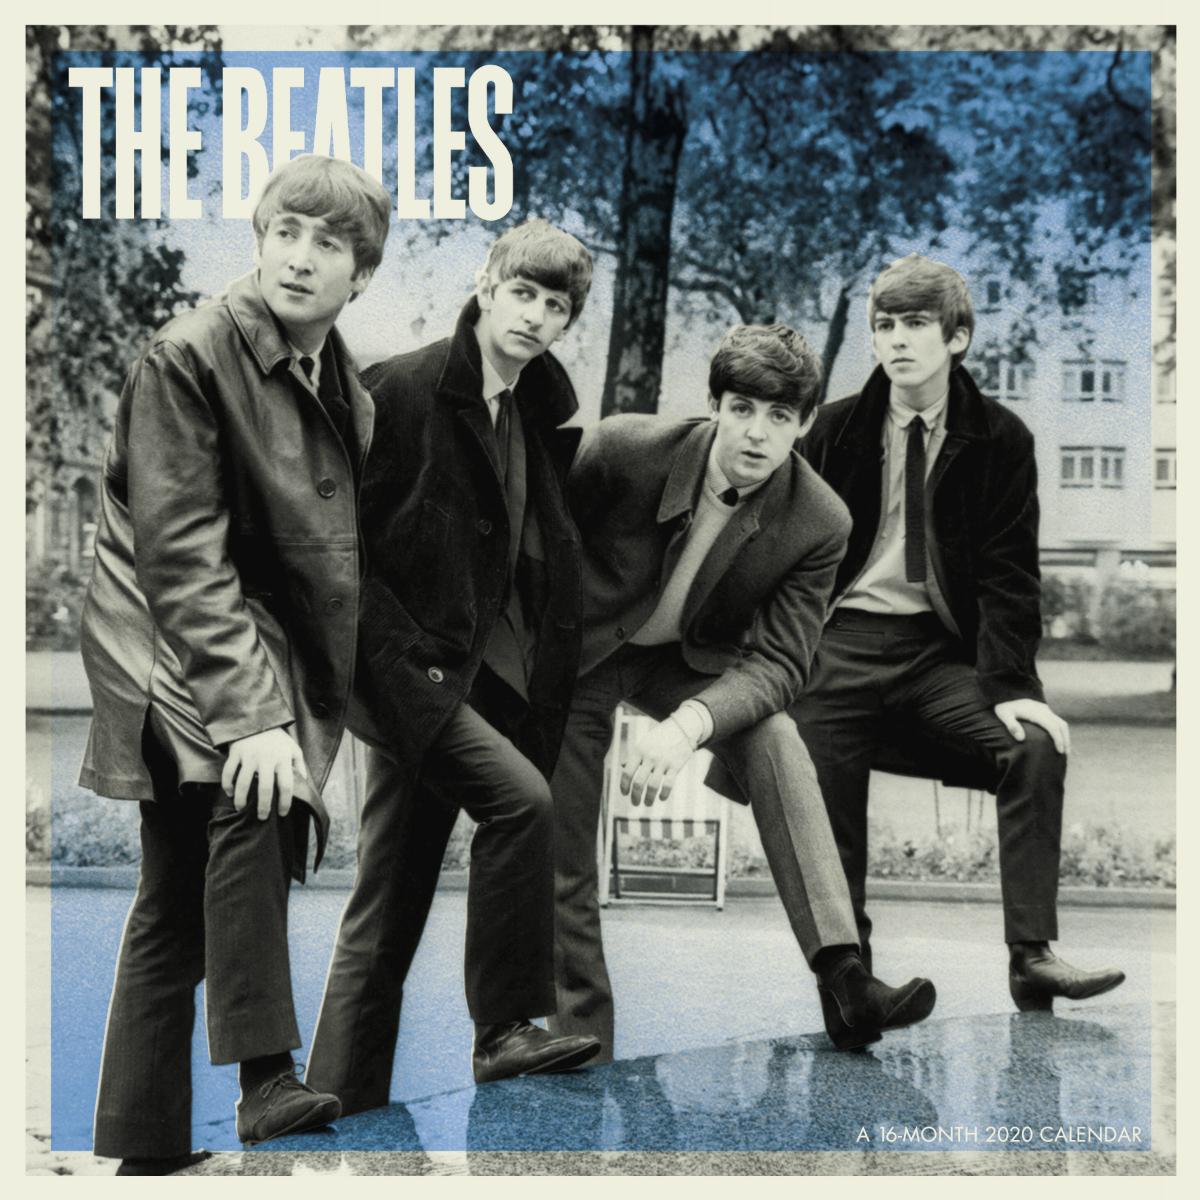 The Beatles 2020 Wall Calendar